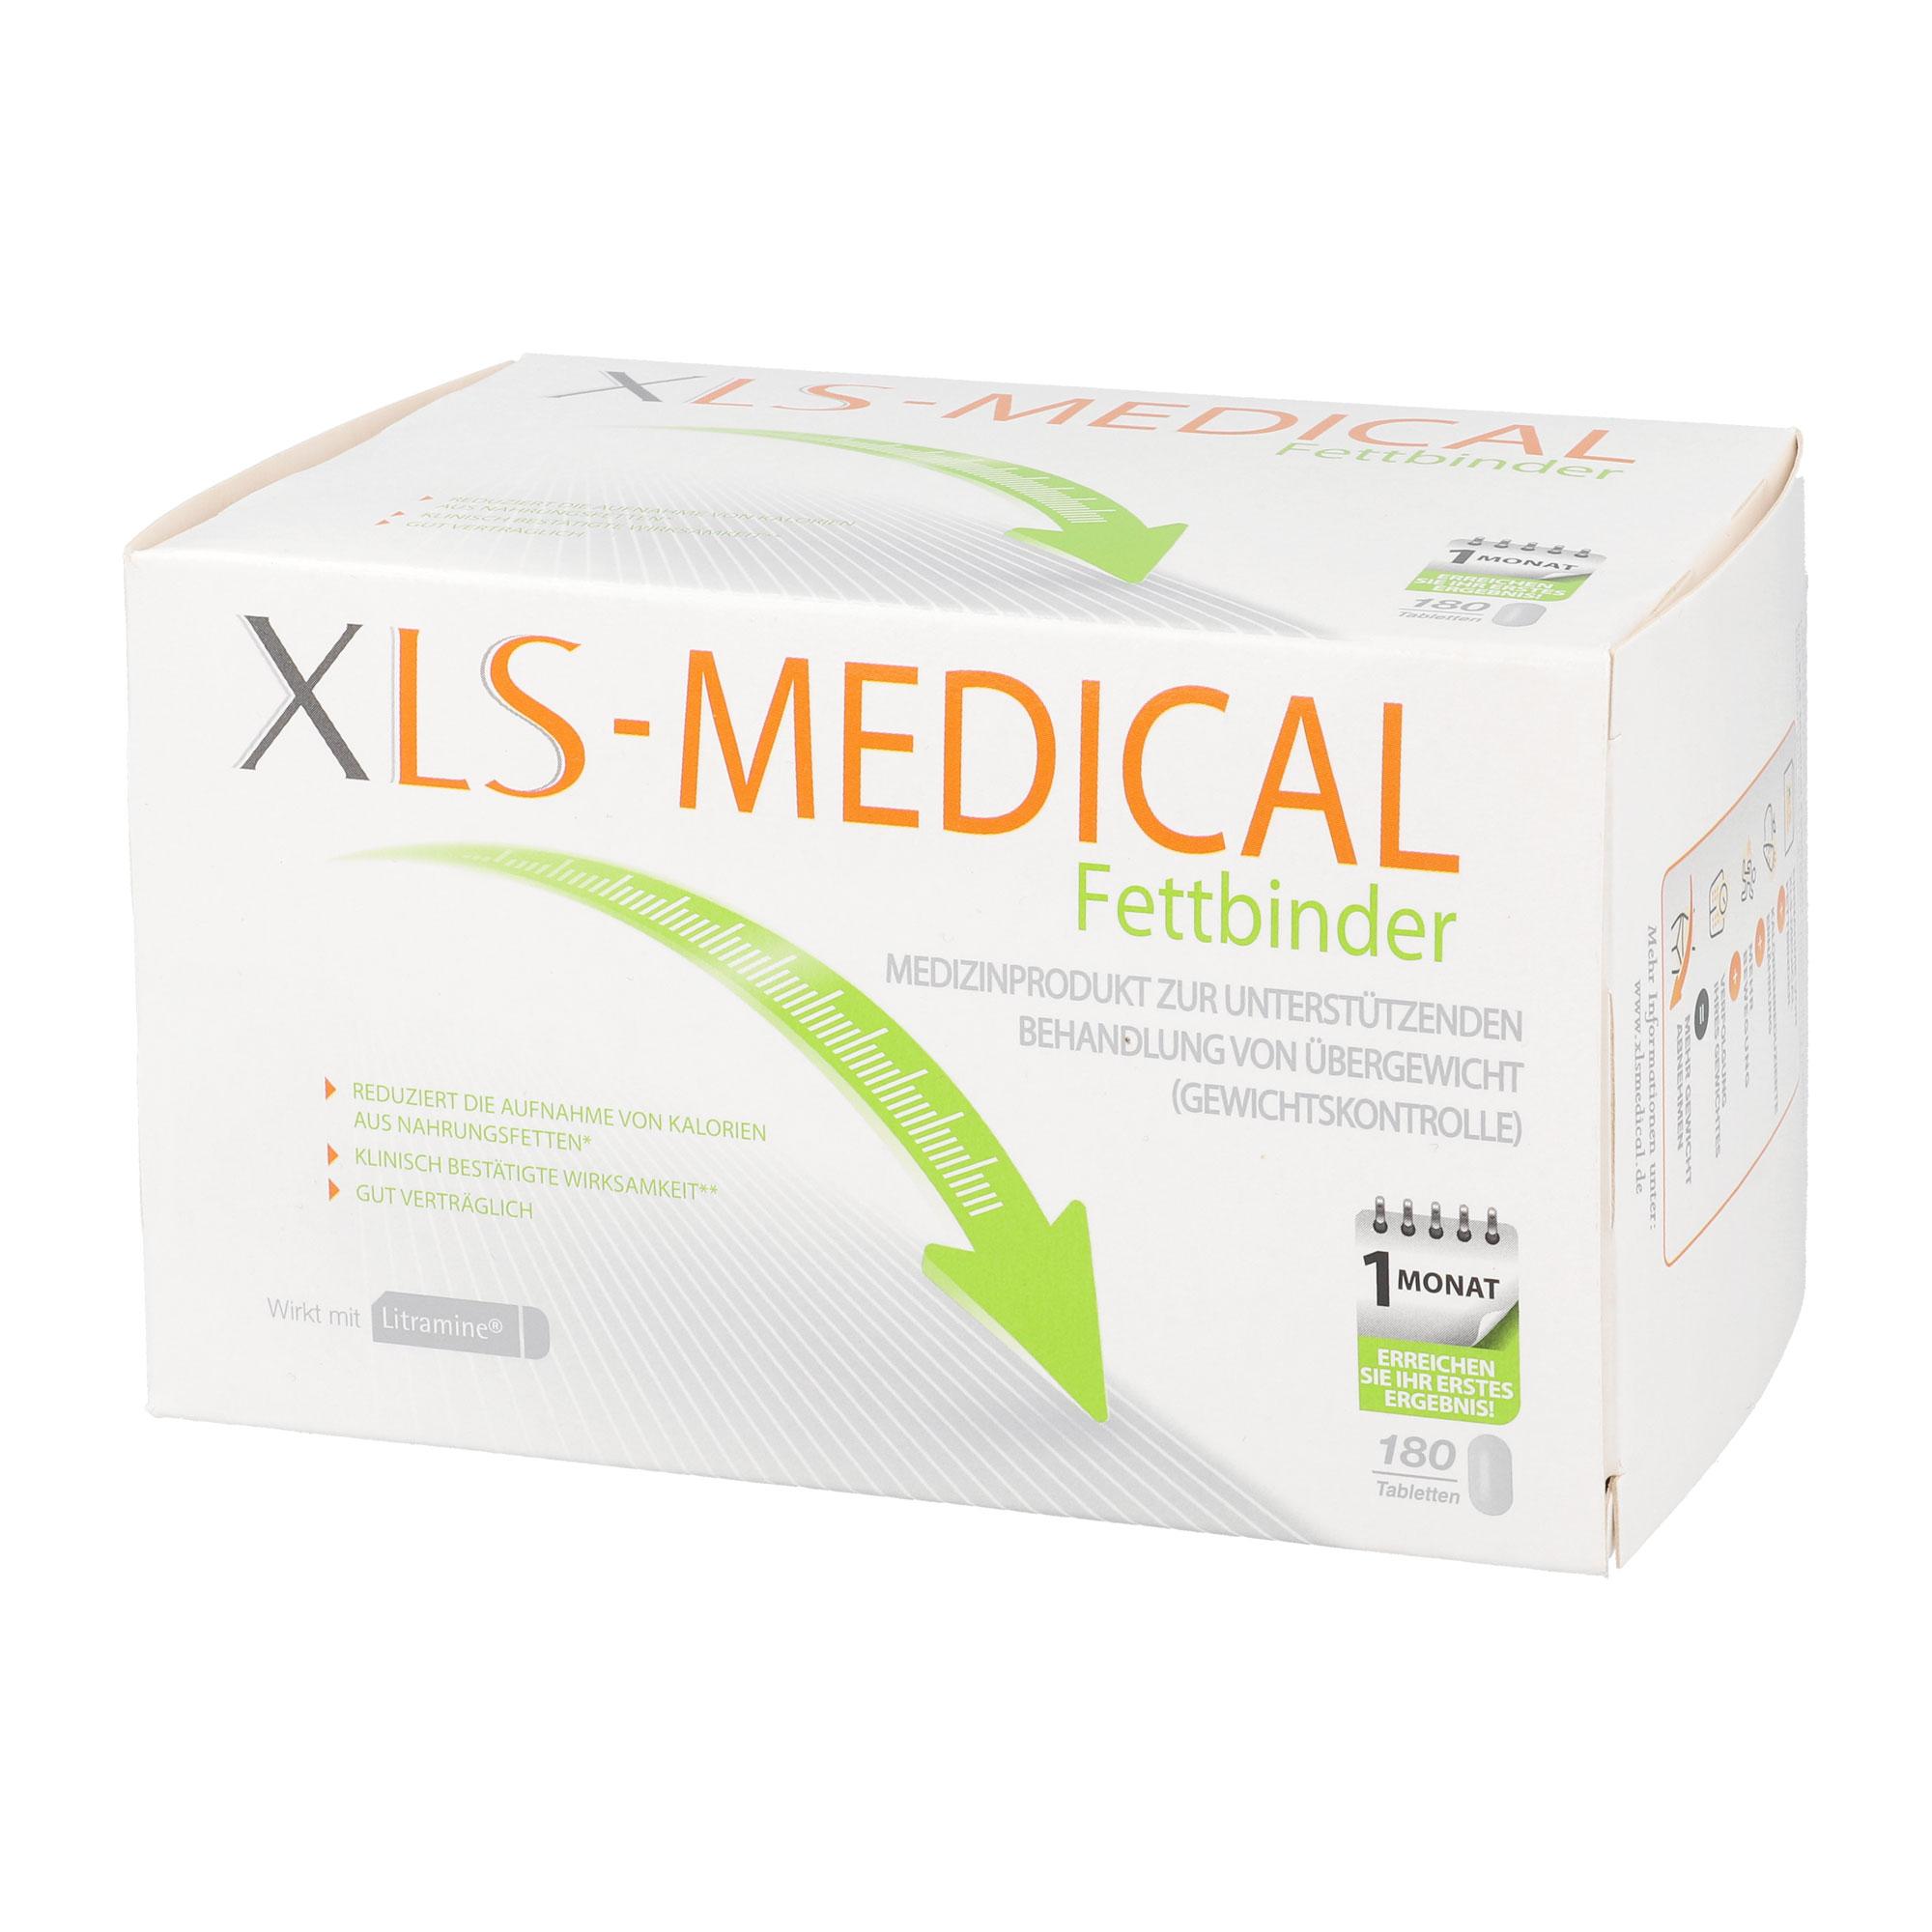 XLS-Medical Fettbinder Monatspackung